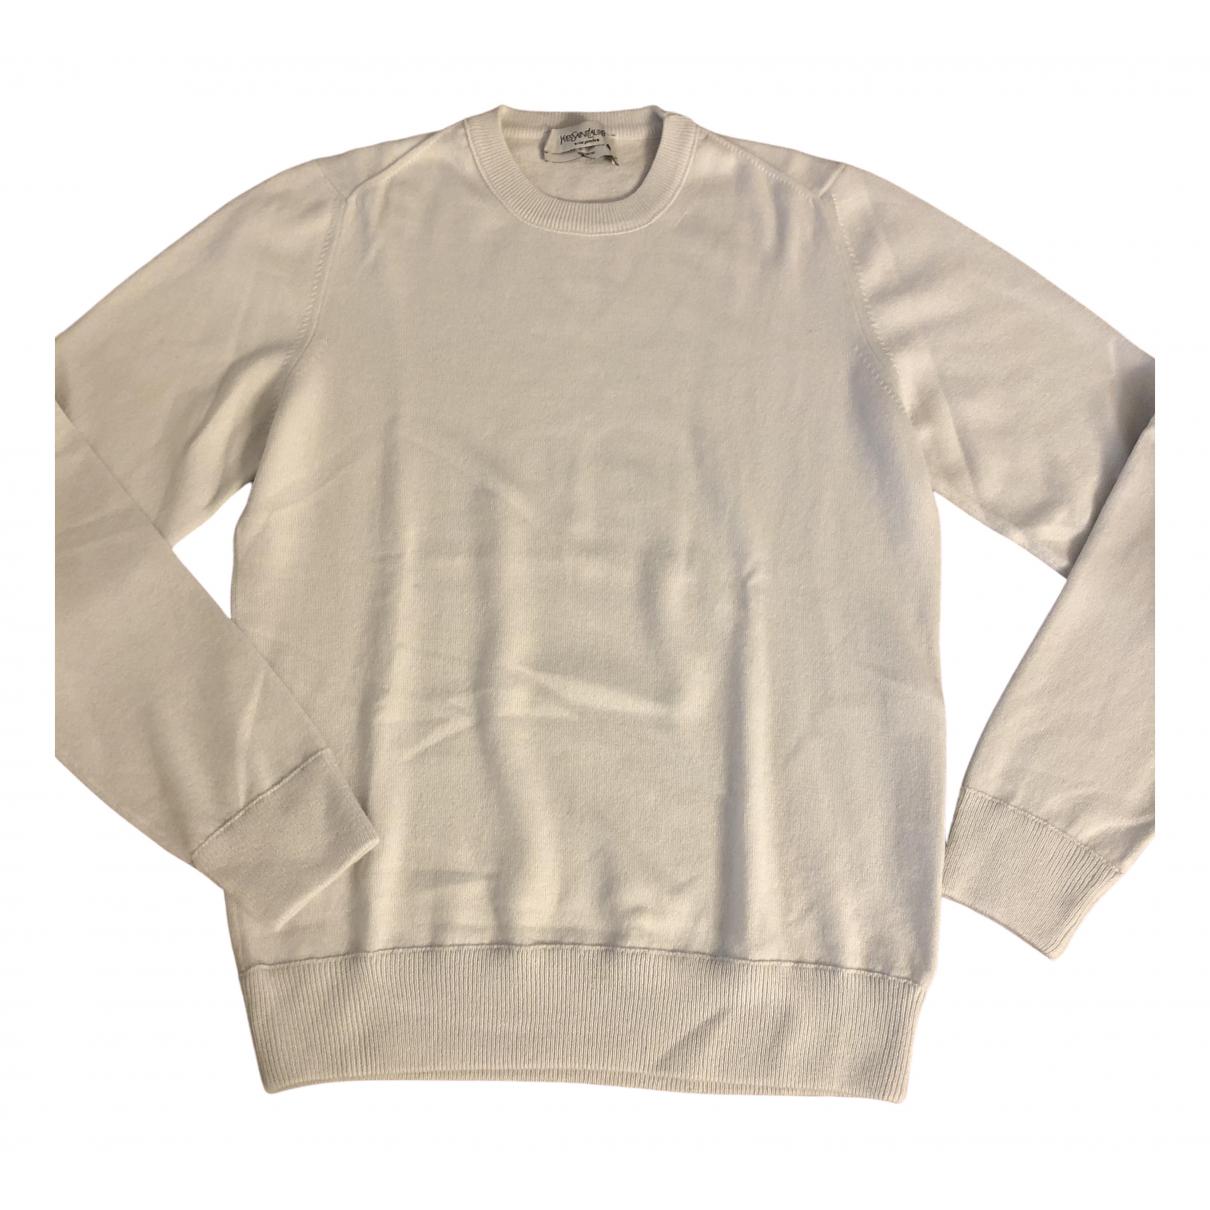 Yves Saint Laurent \N Cashmere Knitwear for Women M International